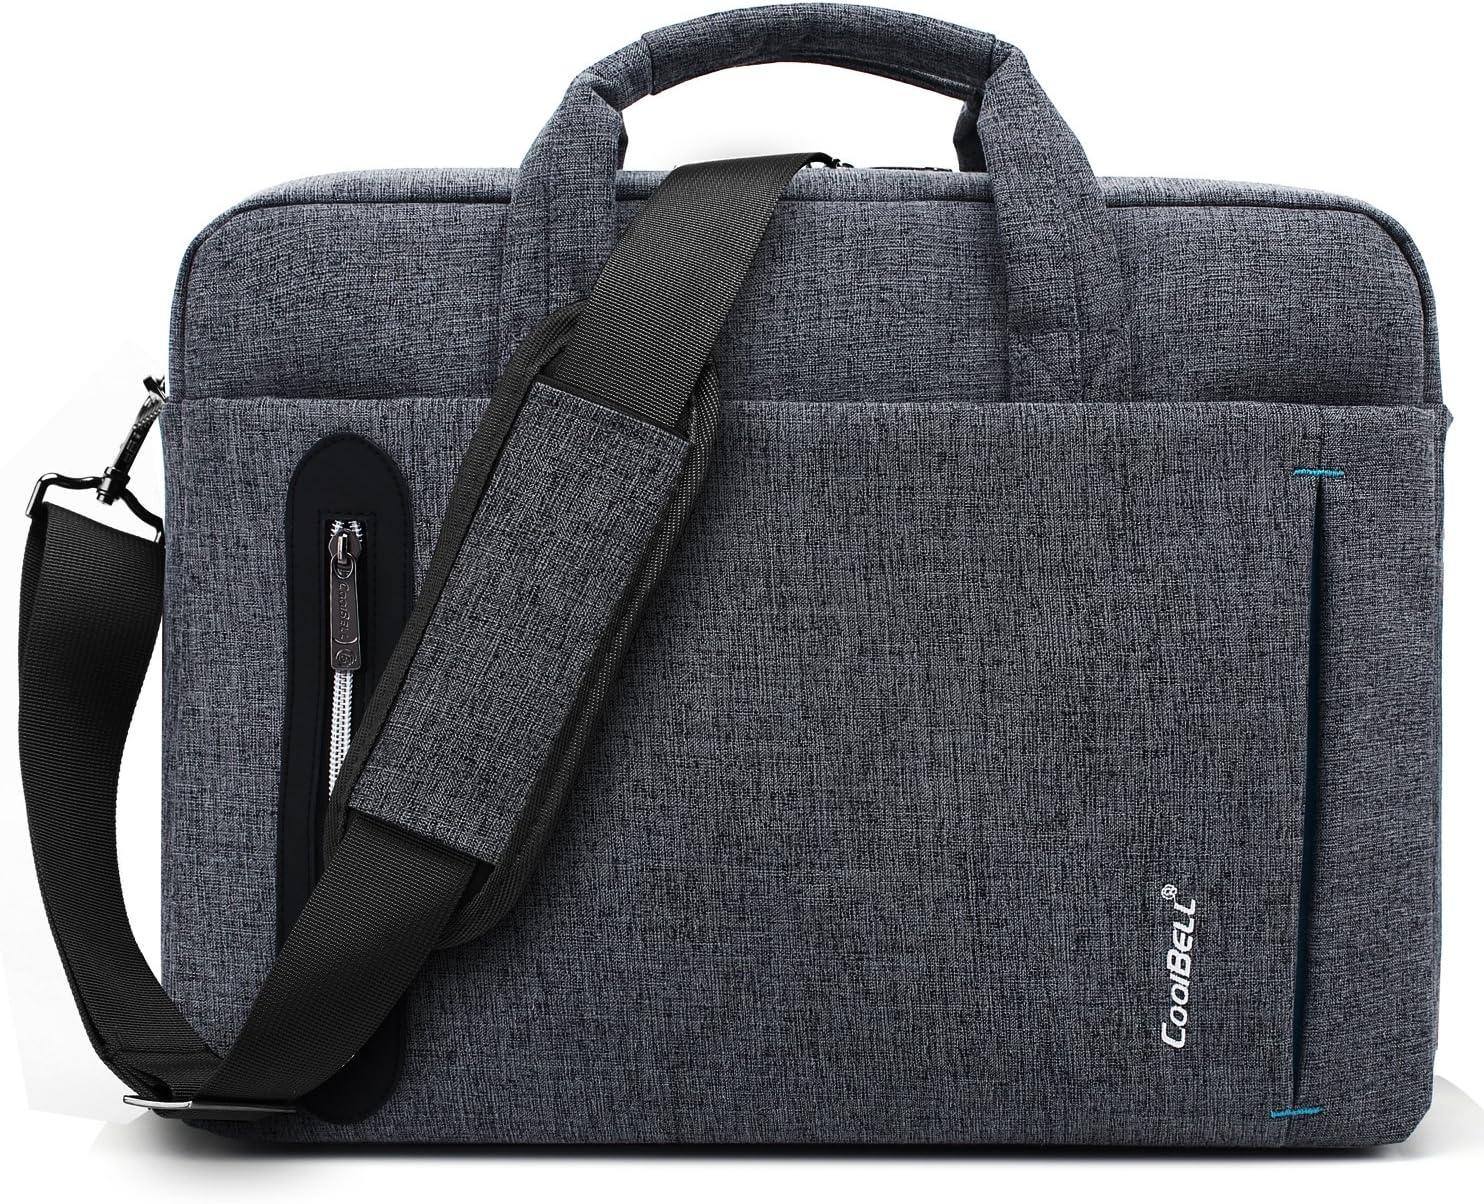 CoolBELL 15.6 inch Laptop Bag Messenger Bag Hand Bag Multi-compartment Briefcase Oxford Nylon Shoulder Bag For Laptop/Ultrabook/HP/Acer/Macbook/Asus/Lenovo/Men/Women (New Grey)